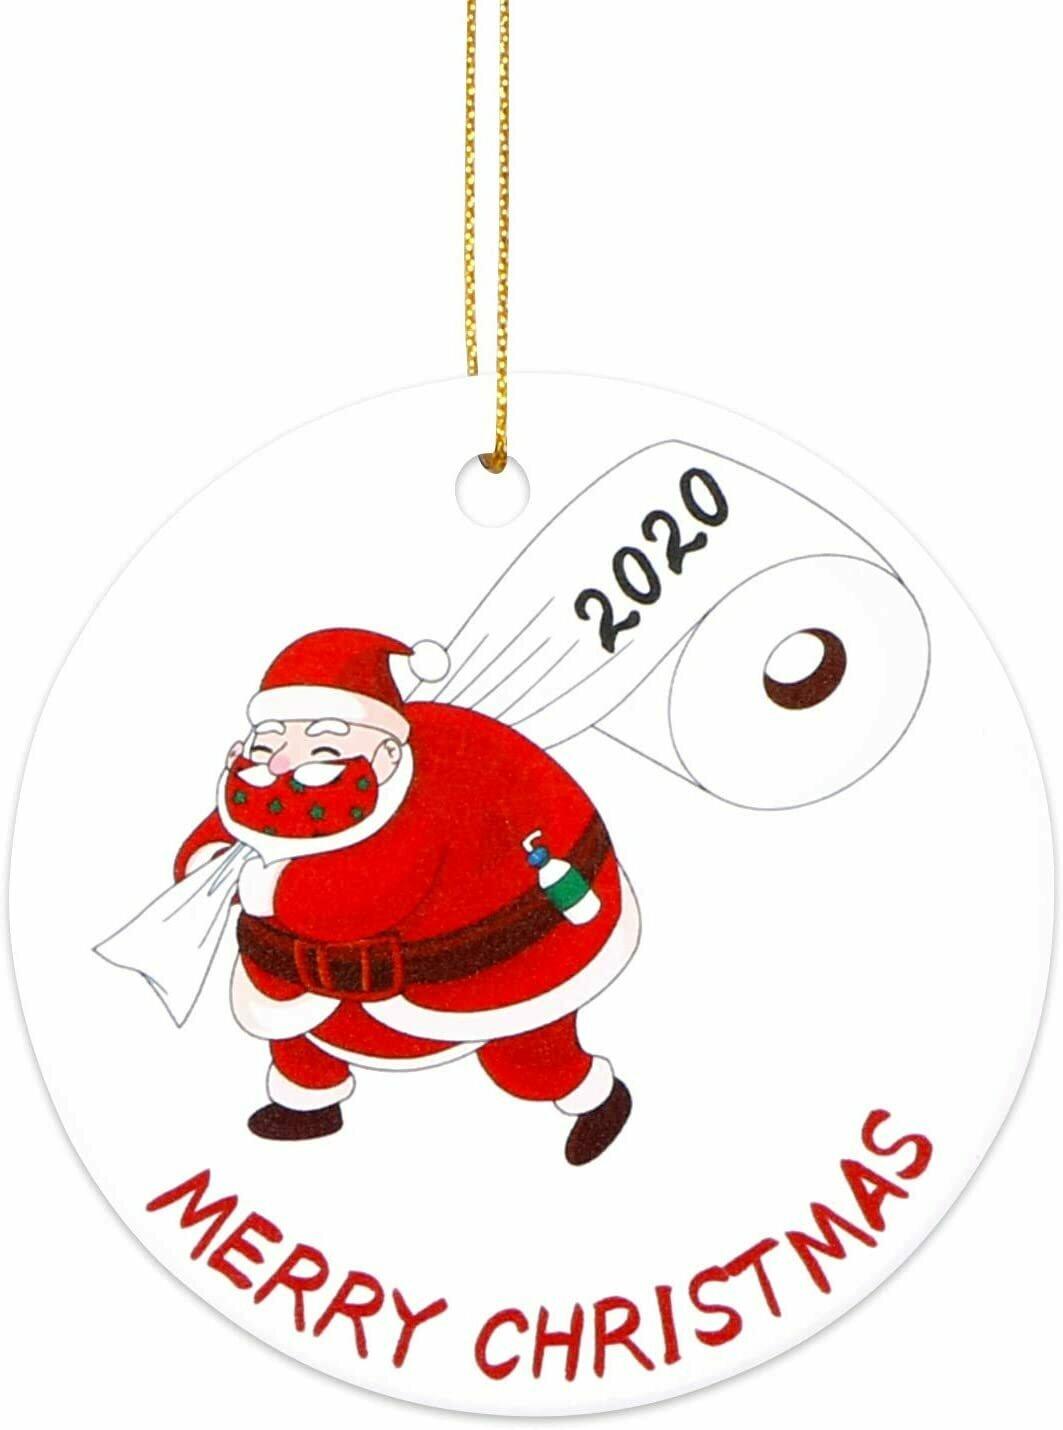 2020 Christmas Circle ceramic Ornament